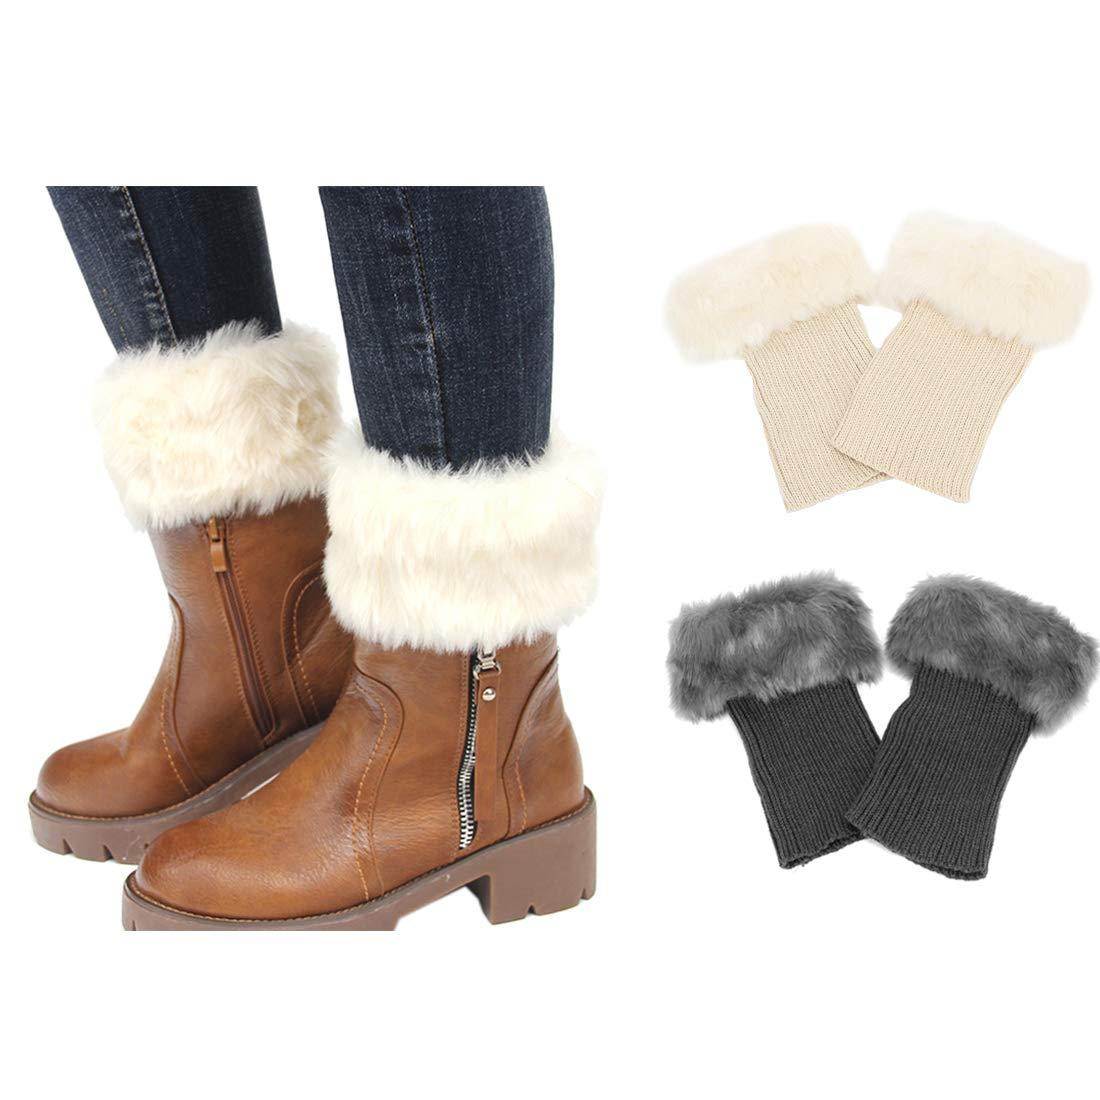 cd91e85613559 FAYBOX Women Winter Faux Fur Boot Cuff Knitting Leg Warmers Short product  image